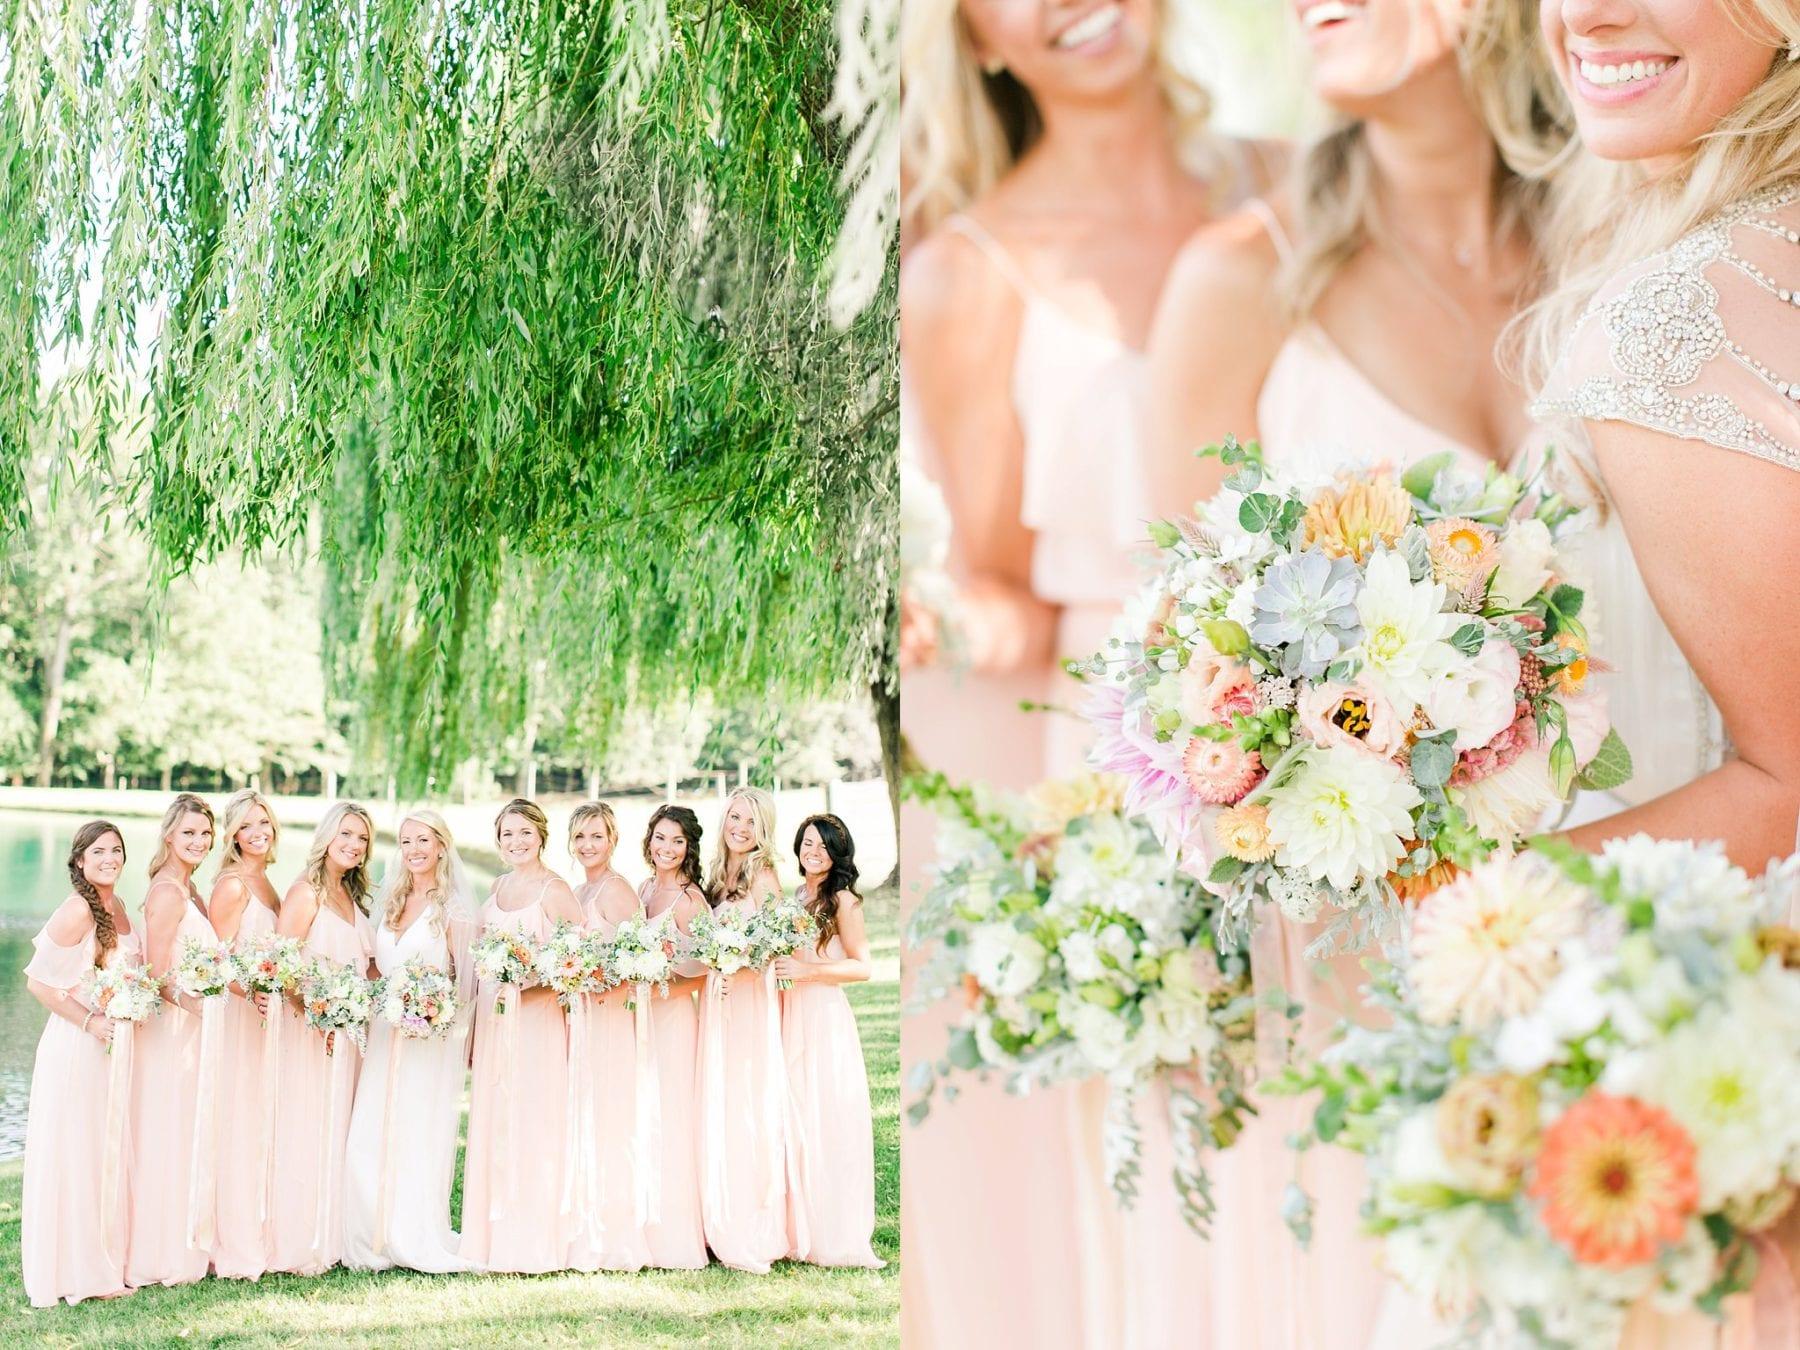 Pond View Farm Wedding Photos Maryland Wedding Photographer Kristen & Ryan Megan Kelsey Photography Blog-142.jpg